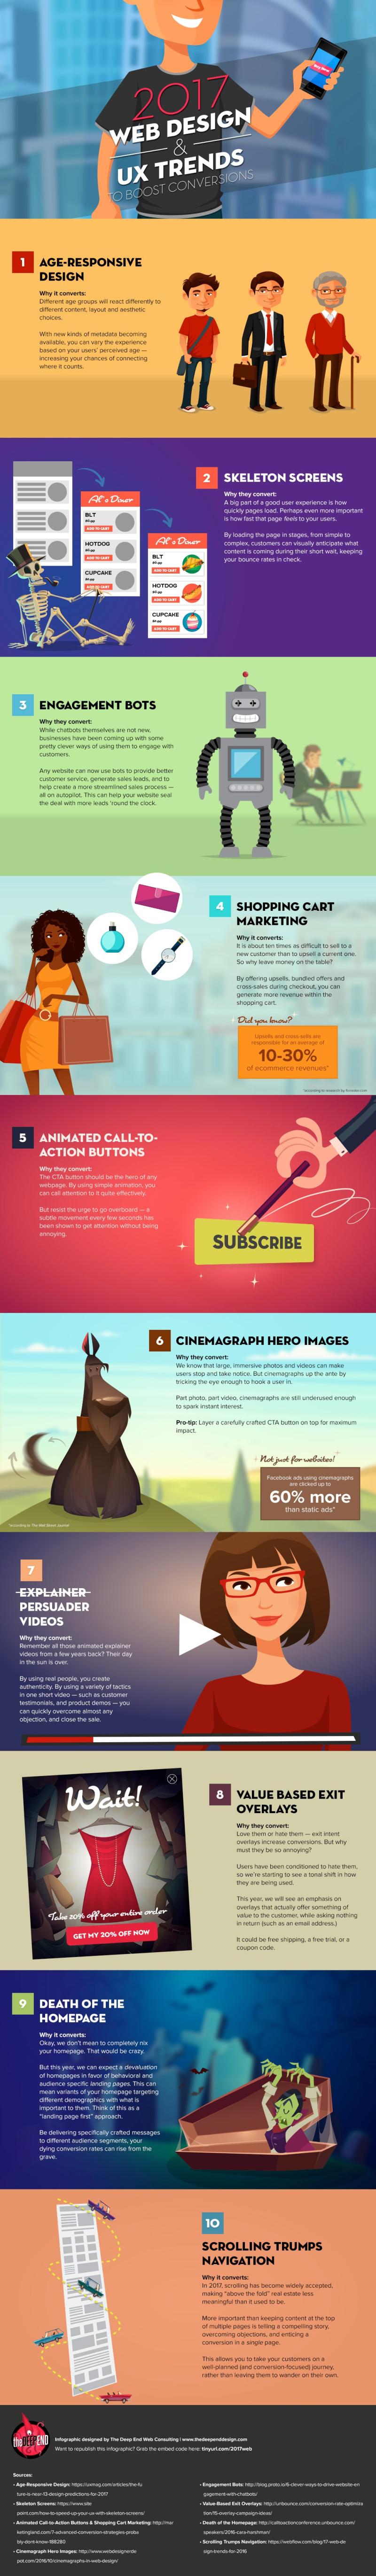 2017-Web-Design-Trends-Infographic